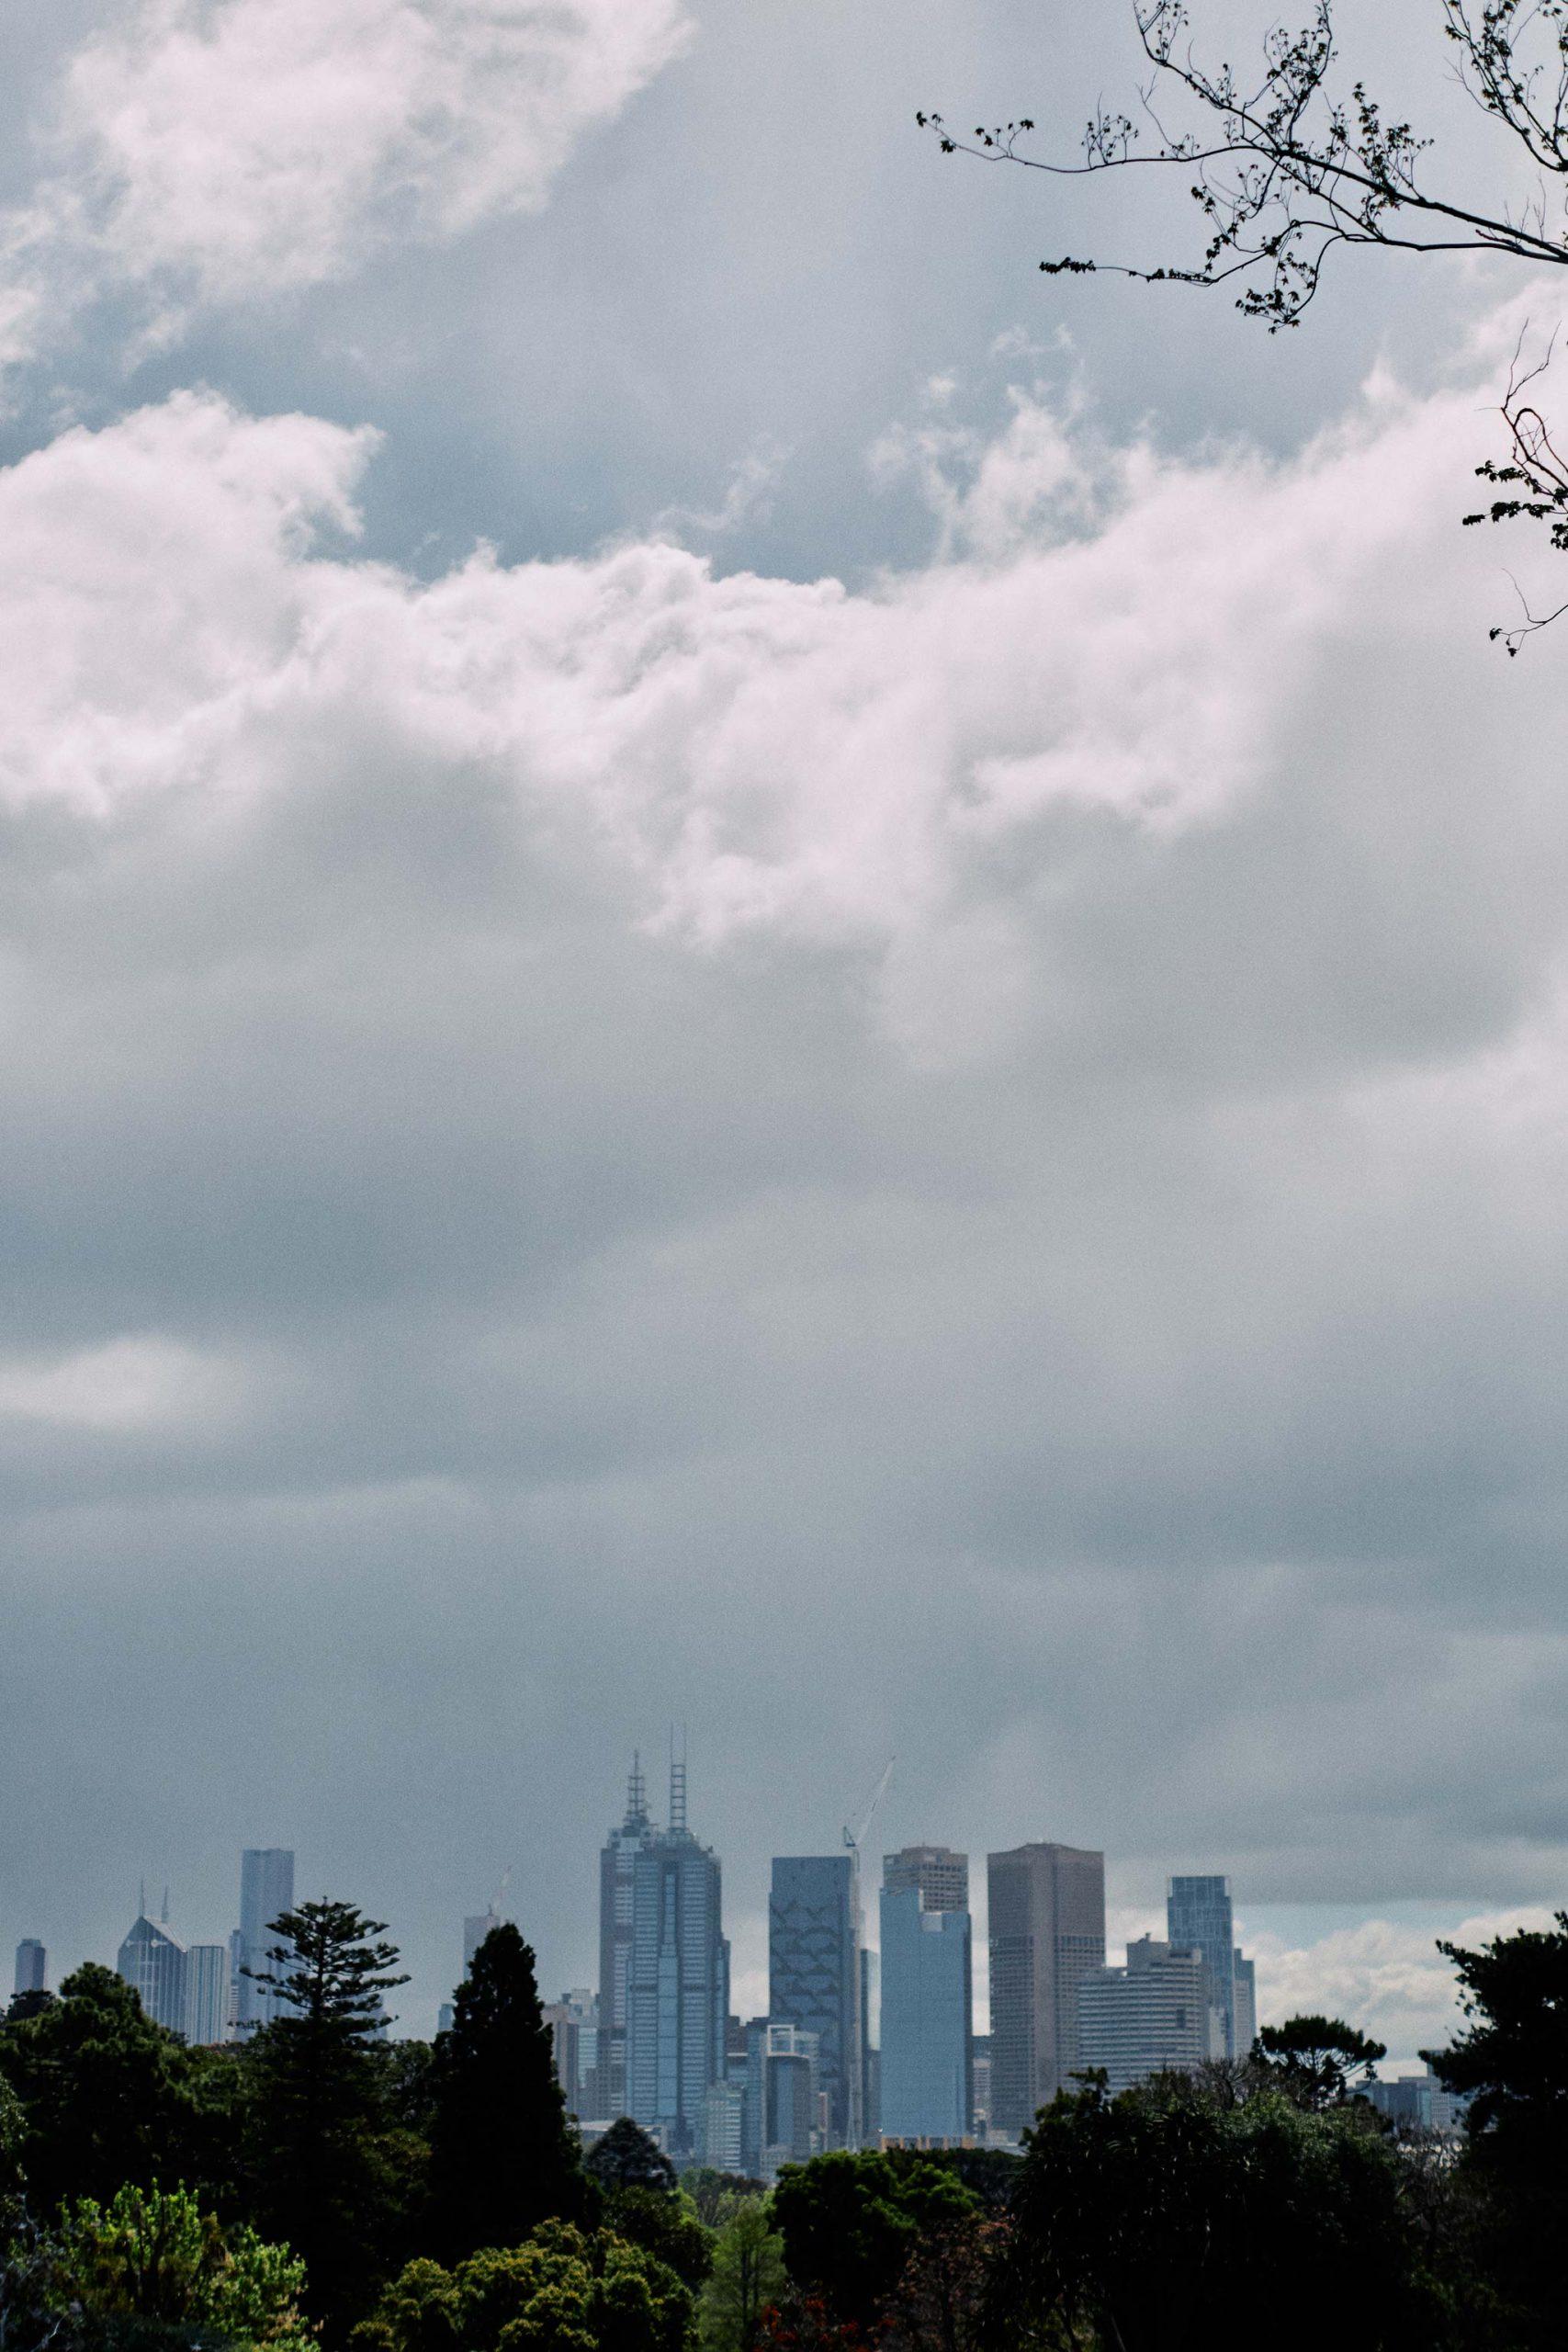 Melbourne Royal Botanical Garden Wedding Ceremony Gloomy Weather